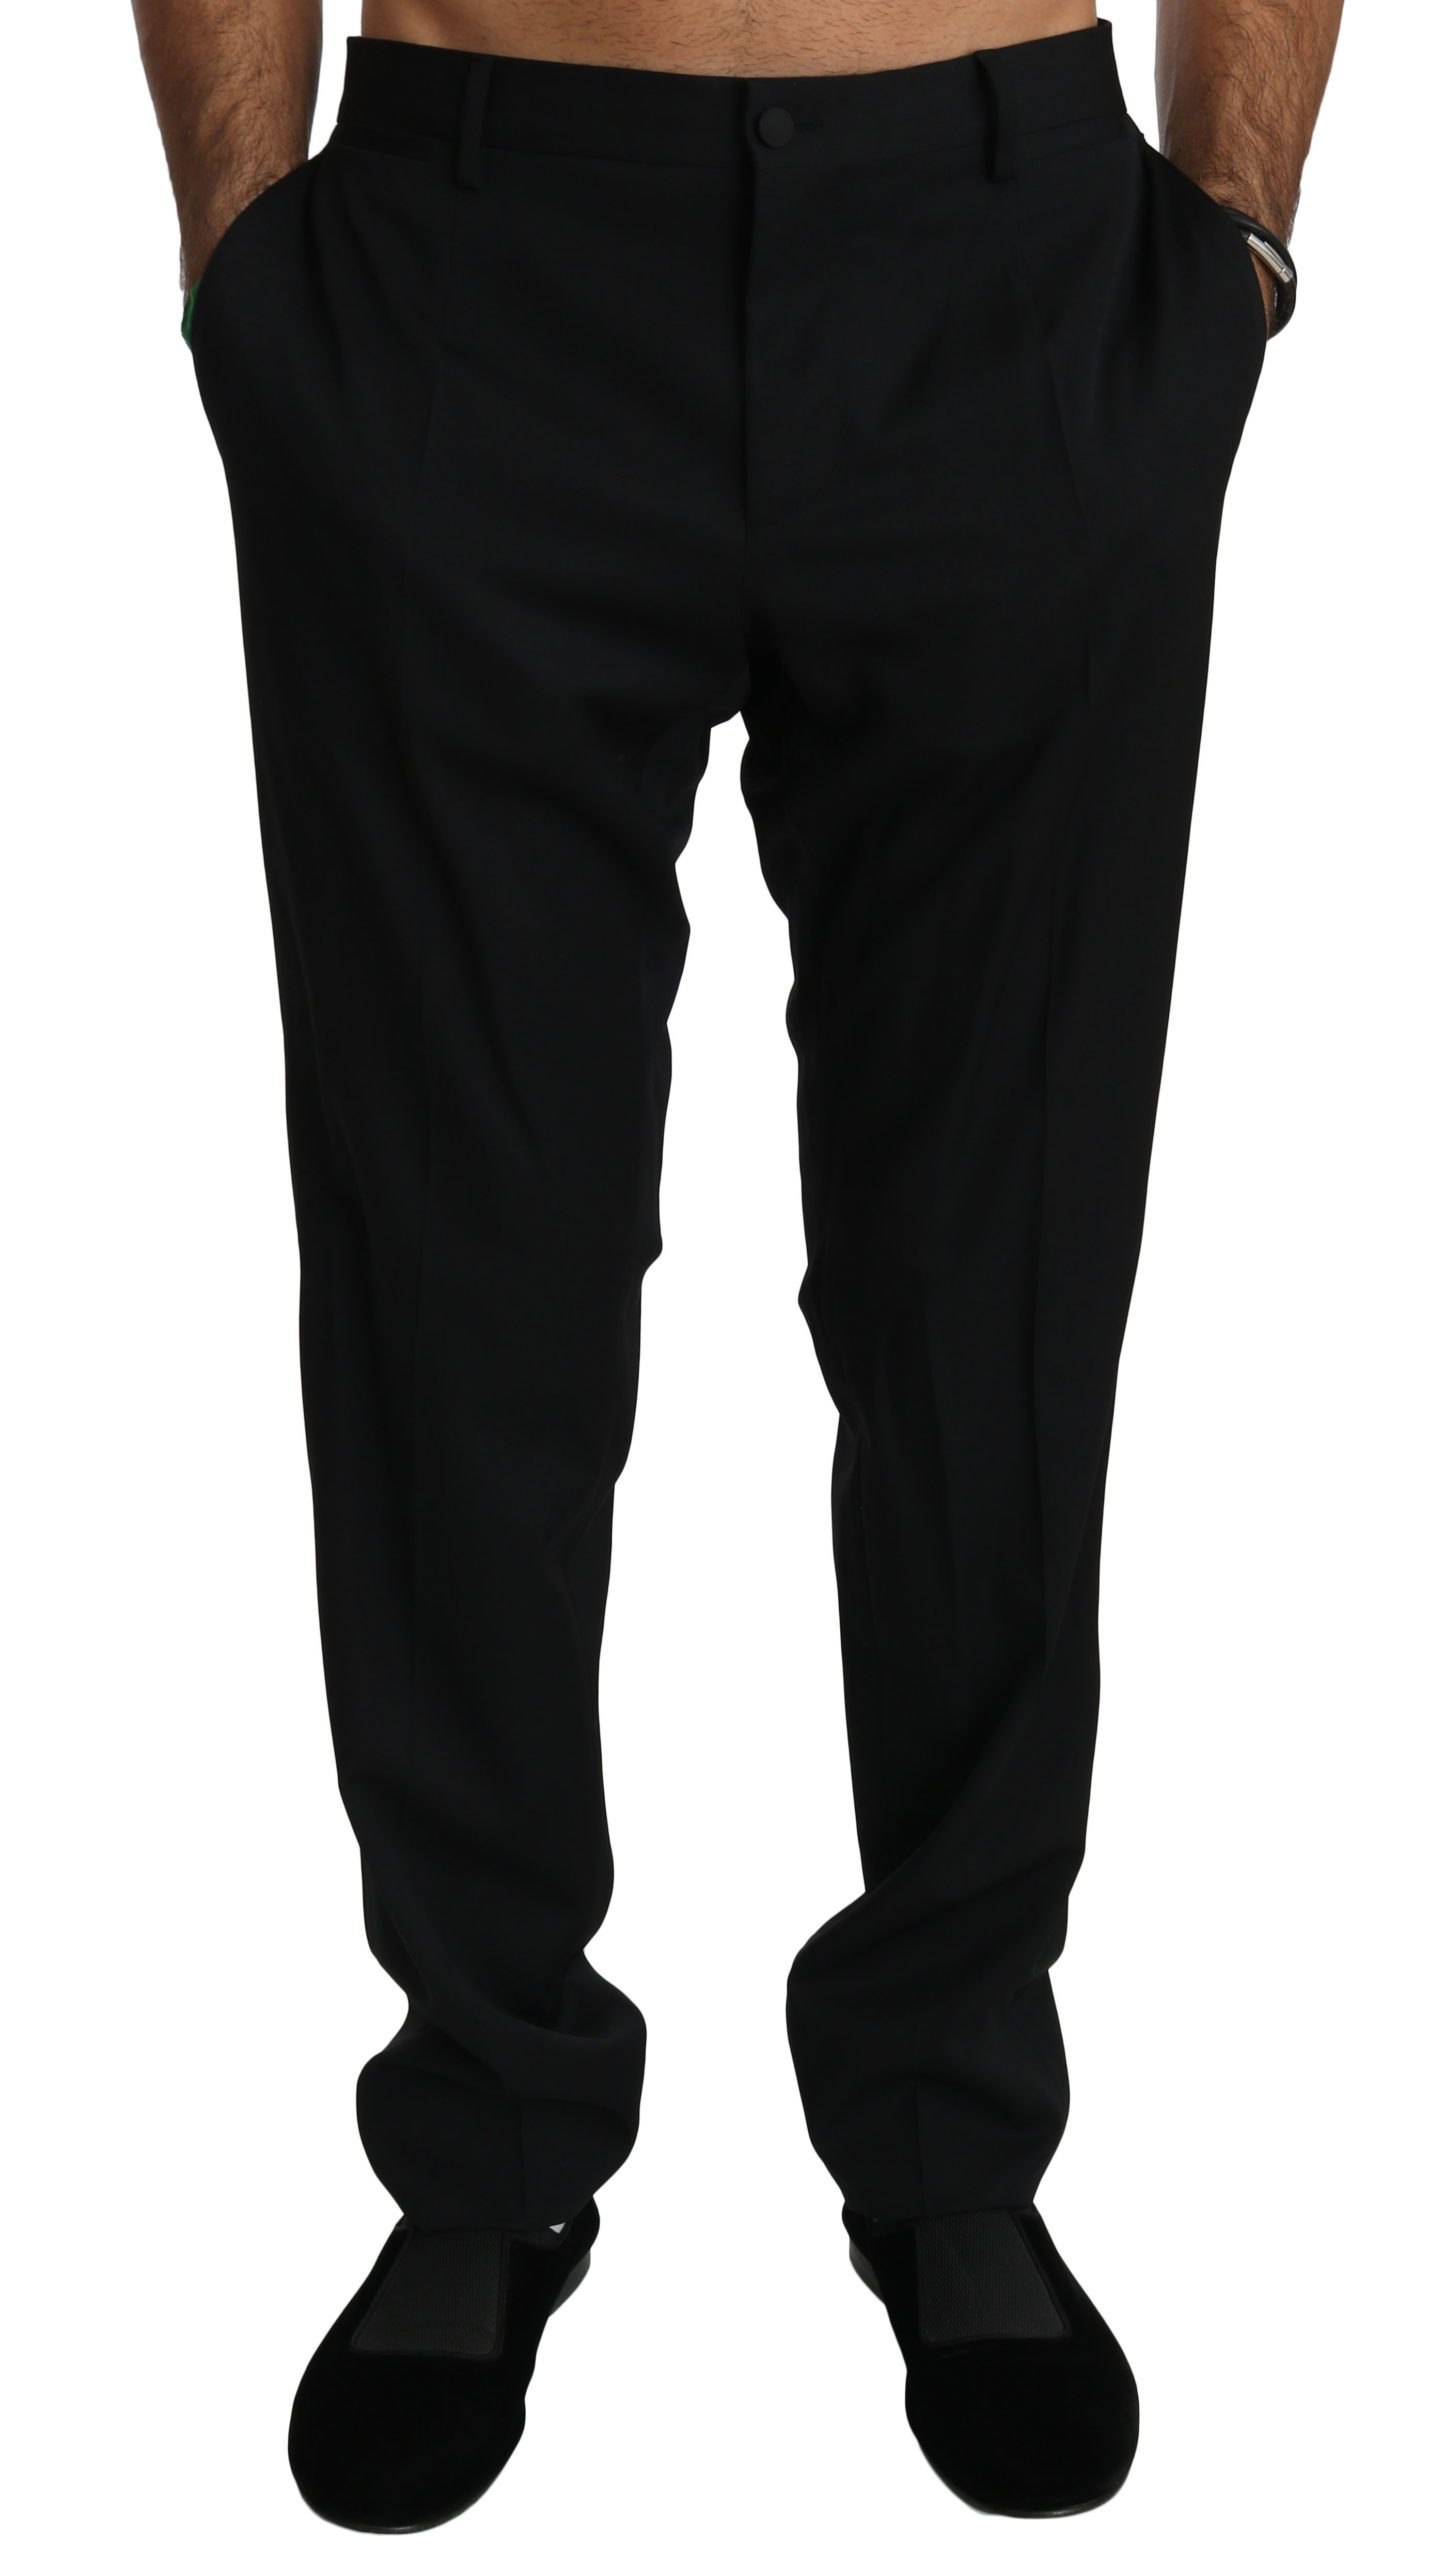 Dolce & Gabbana Men's Slim Formal Wool Trouser Black PAN70757 - IT52   XL